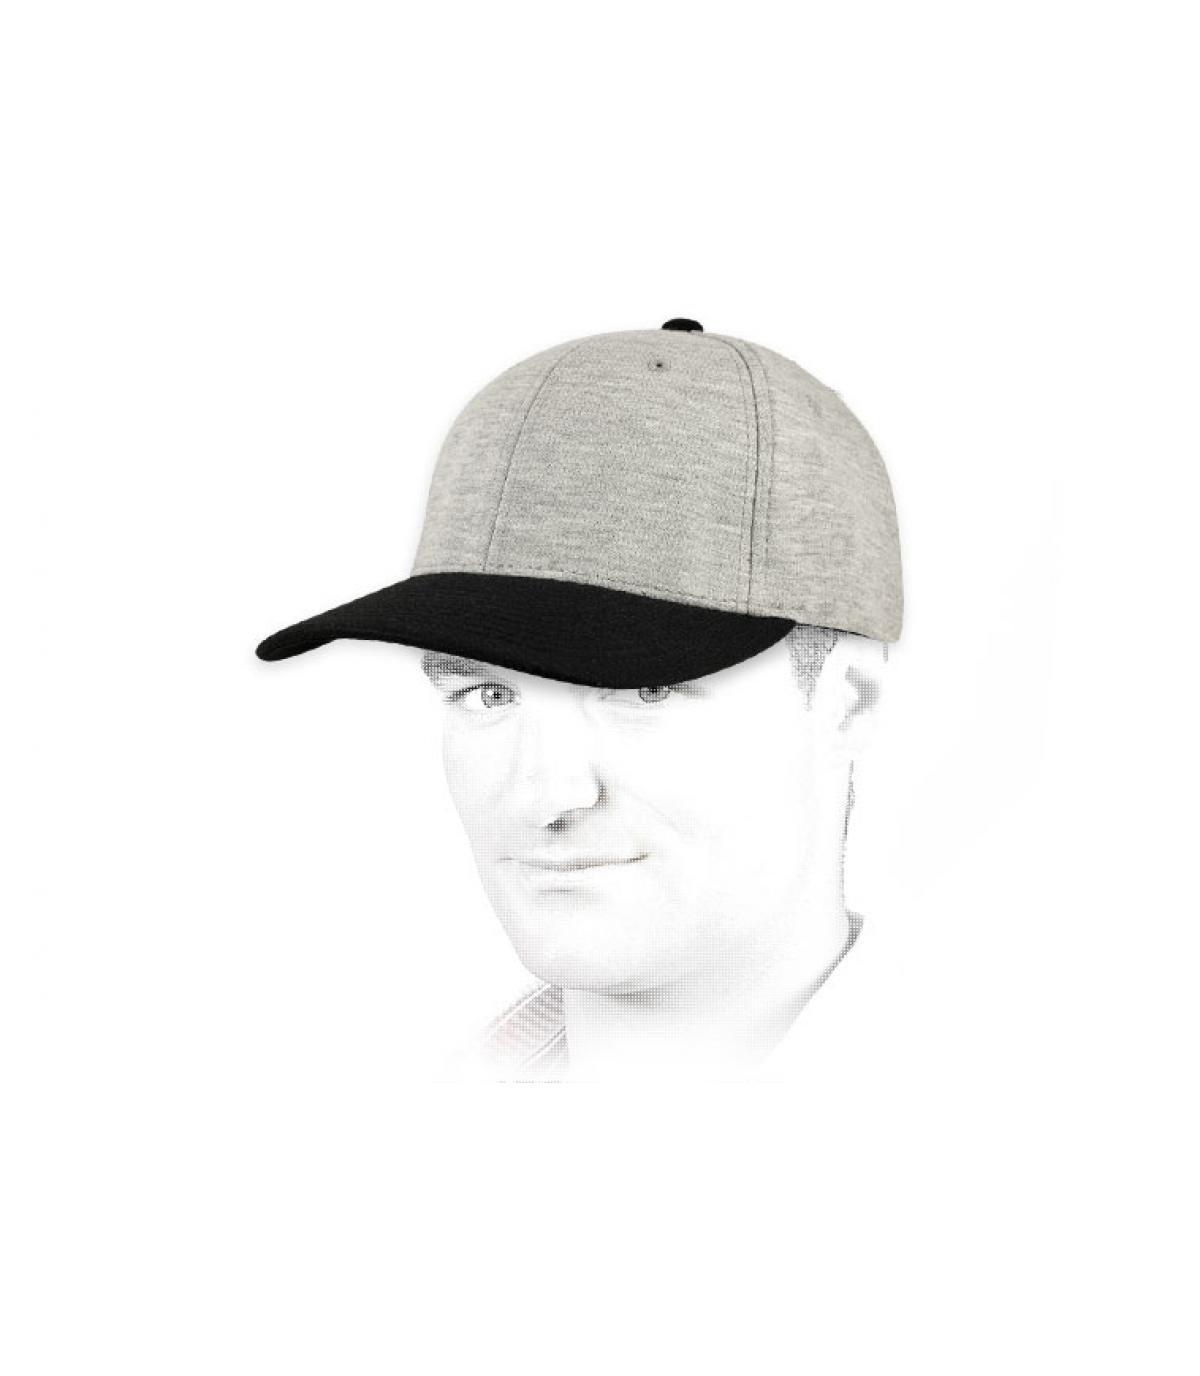 cap jersey grijs zwart